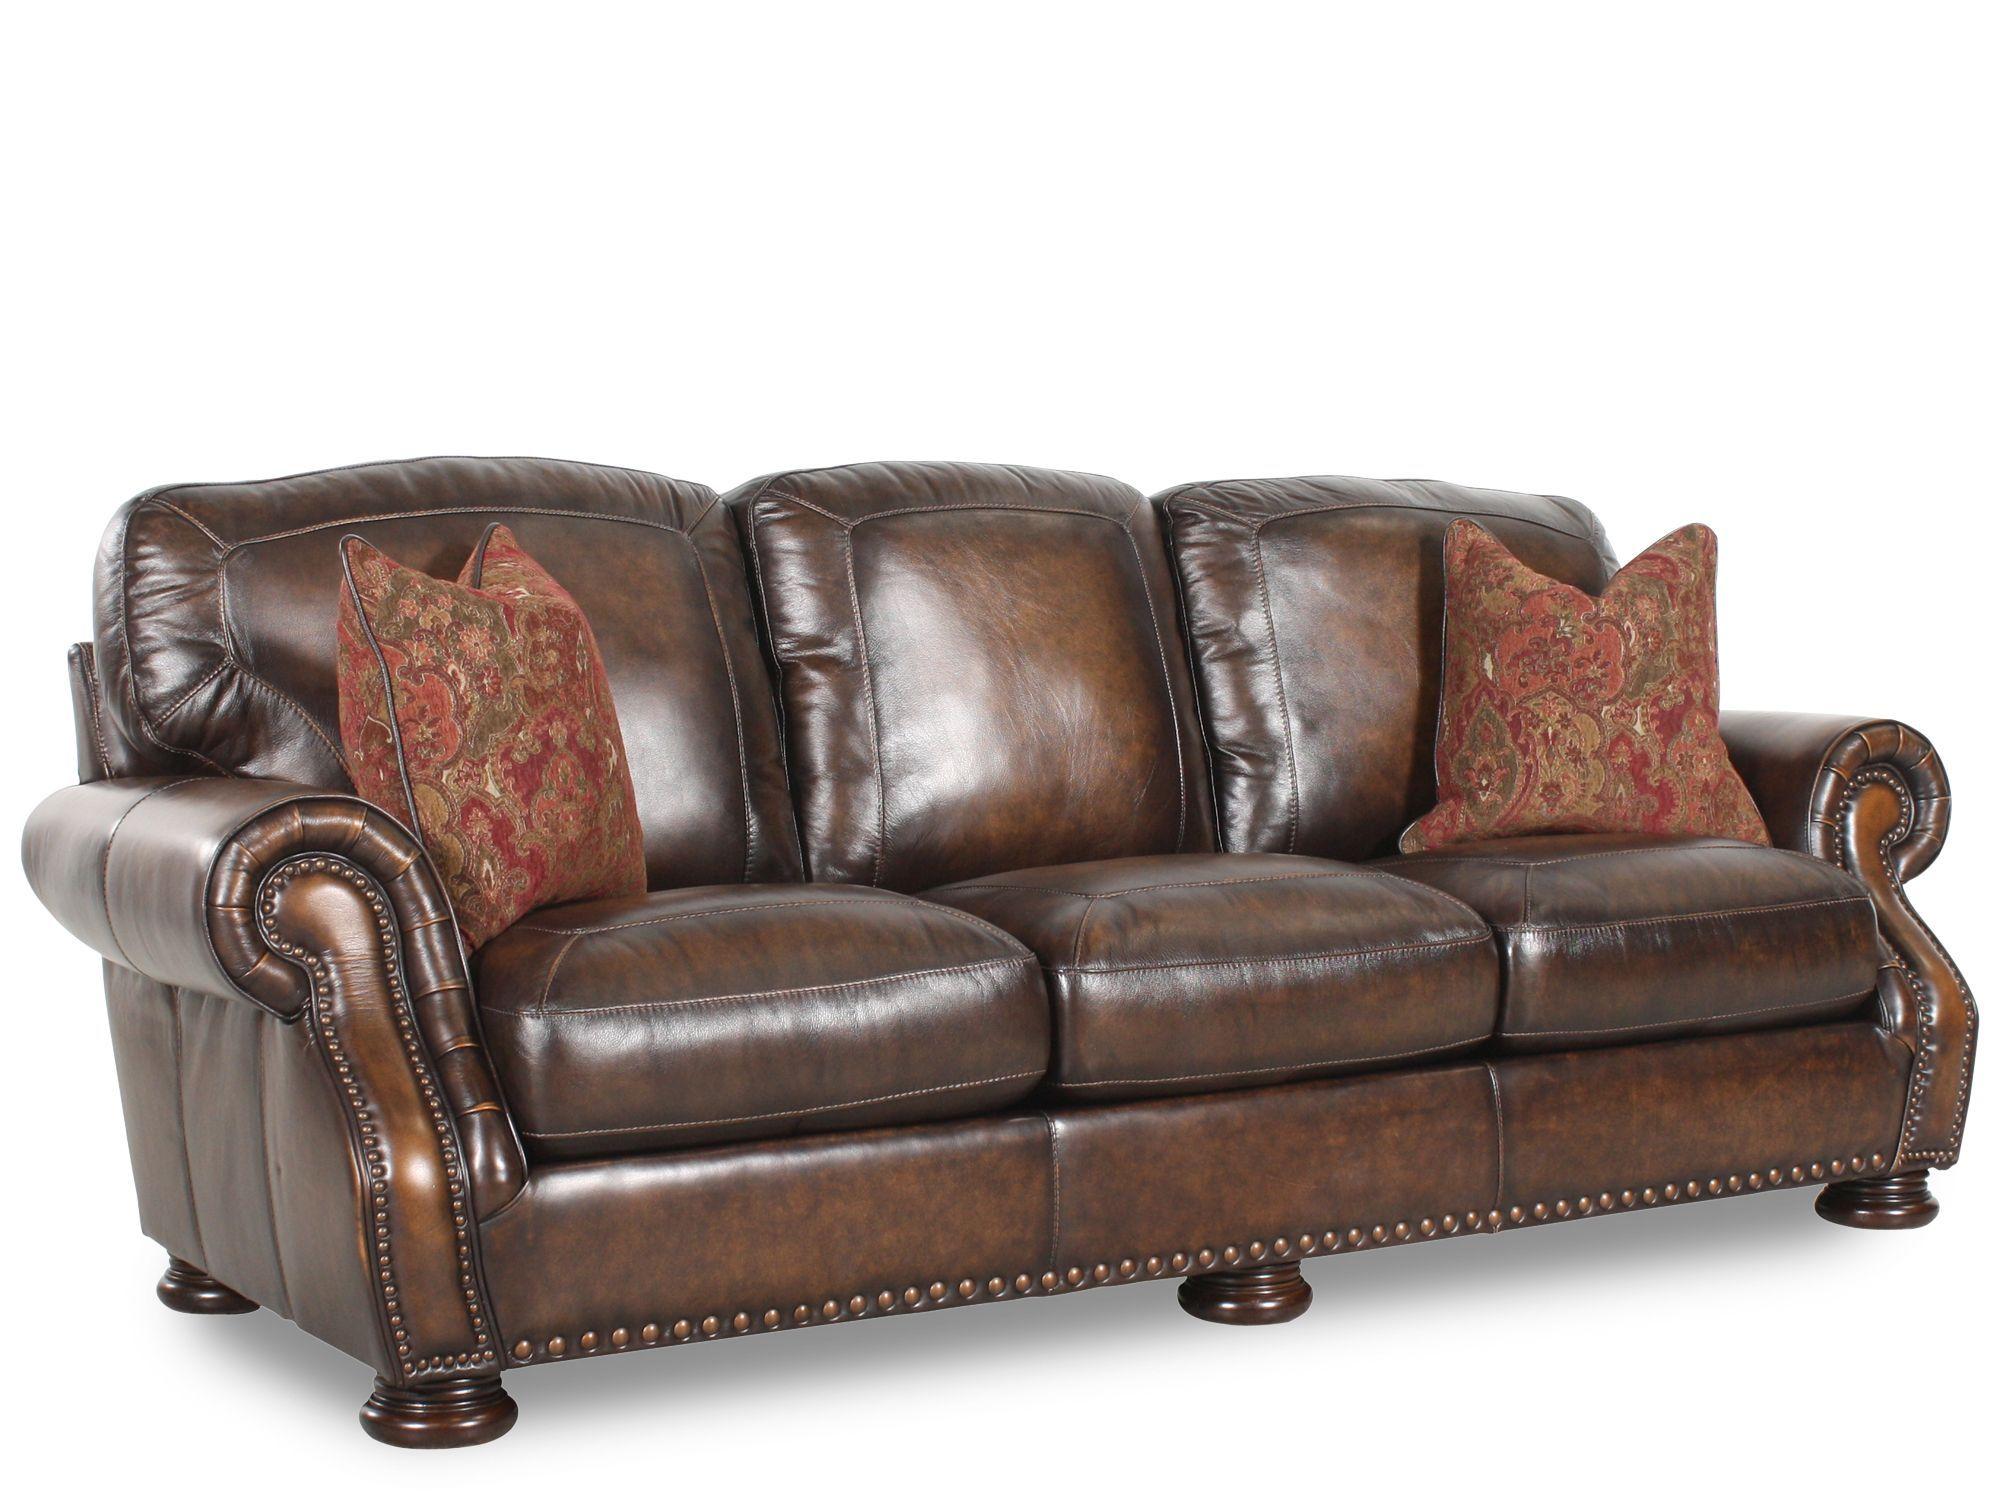 Simon Li Leather Picasso Randwick Sofa Leather sofa